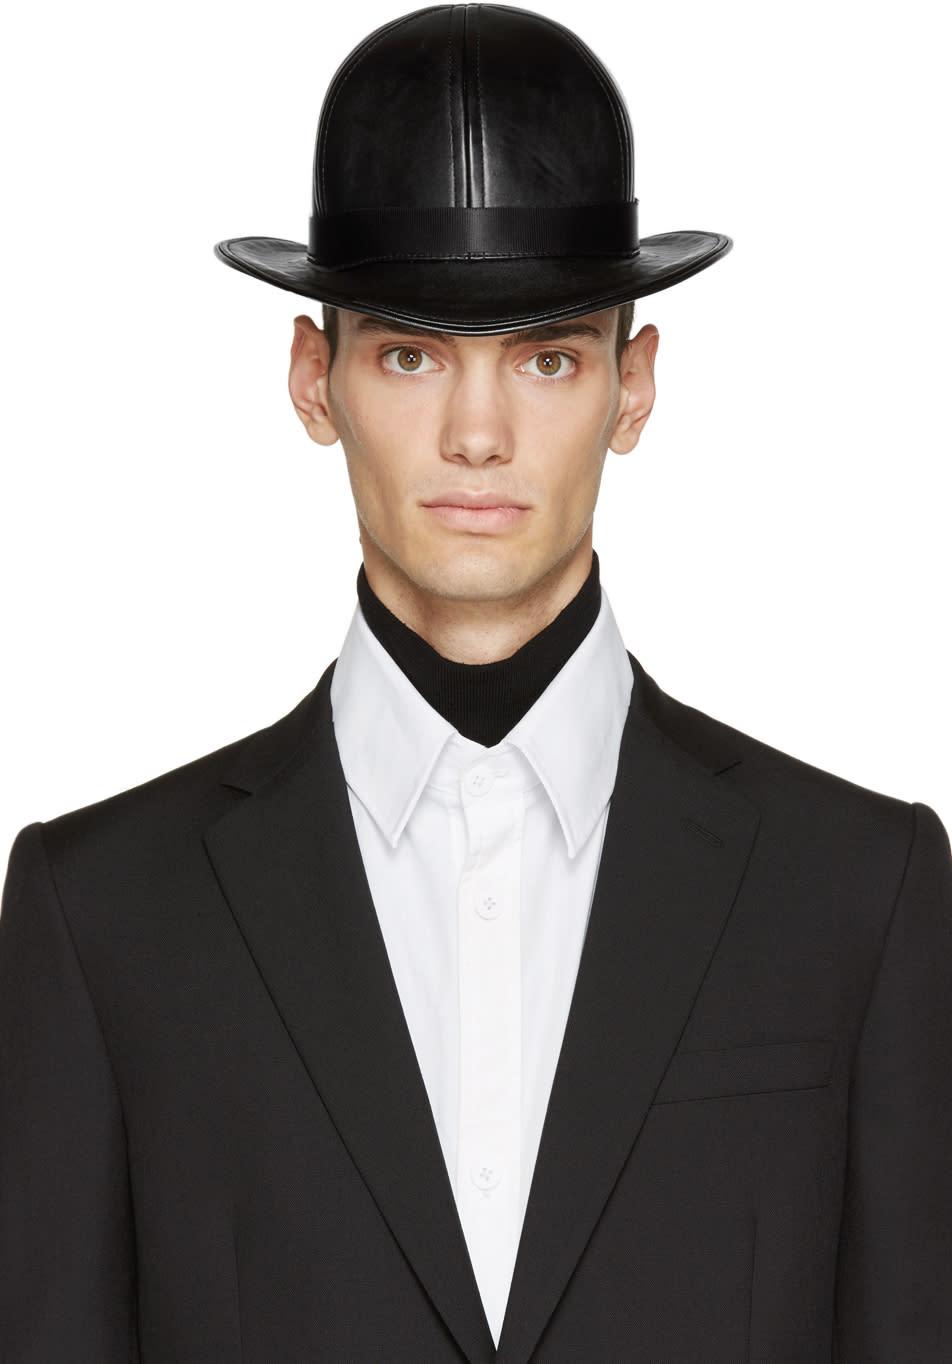 Image of Ktz Black Faux-leather Short Bowler Hat